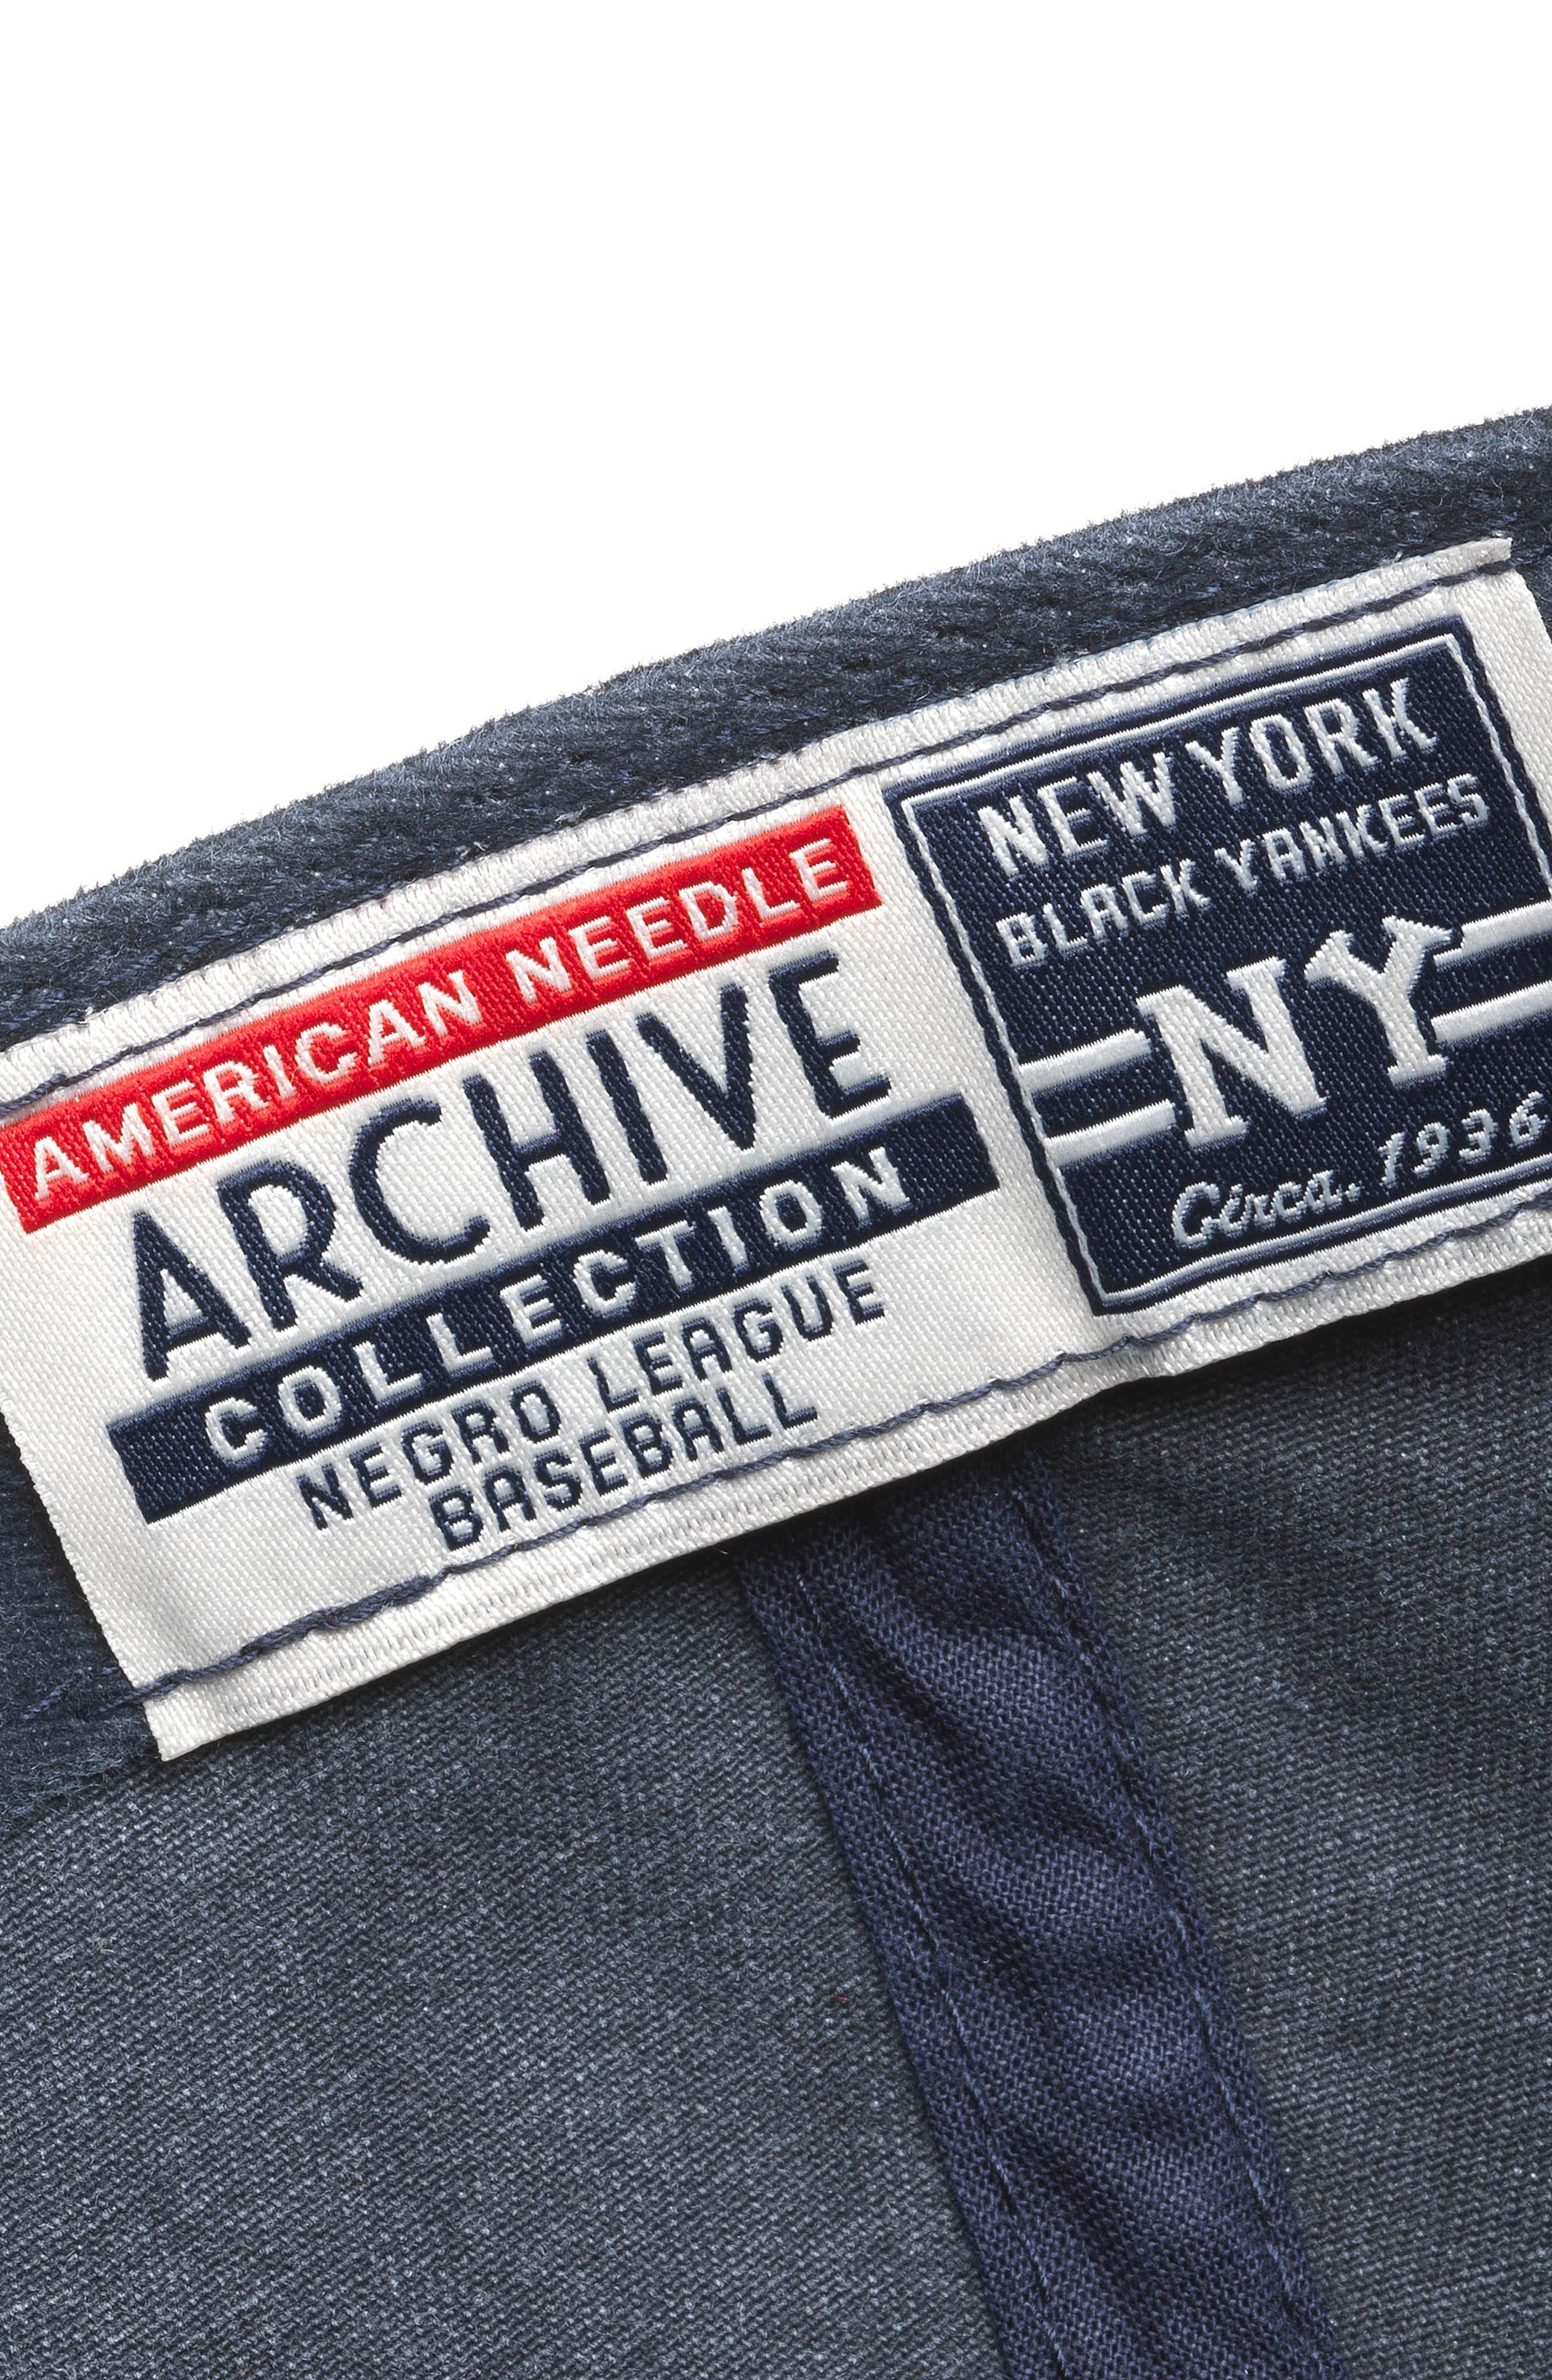 New York Archive Ball Cap,                             Alternate thumbnail 2, color,                             BLUE